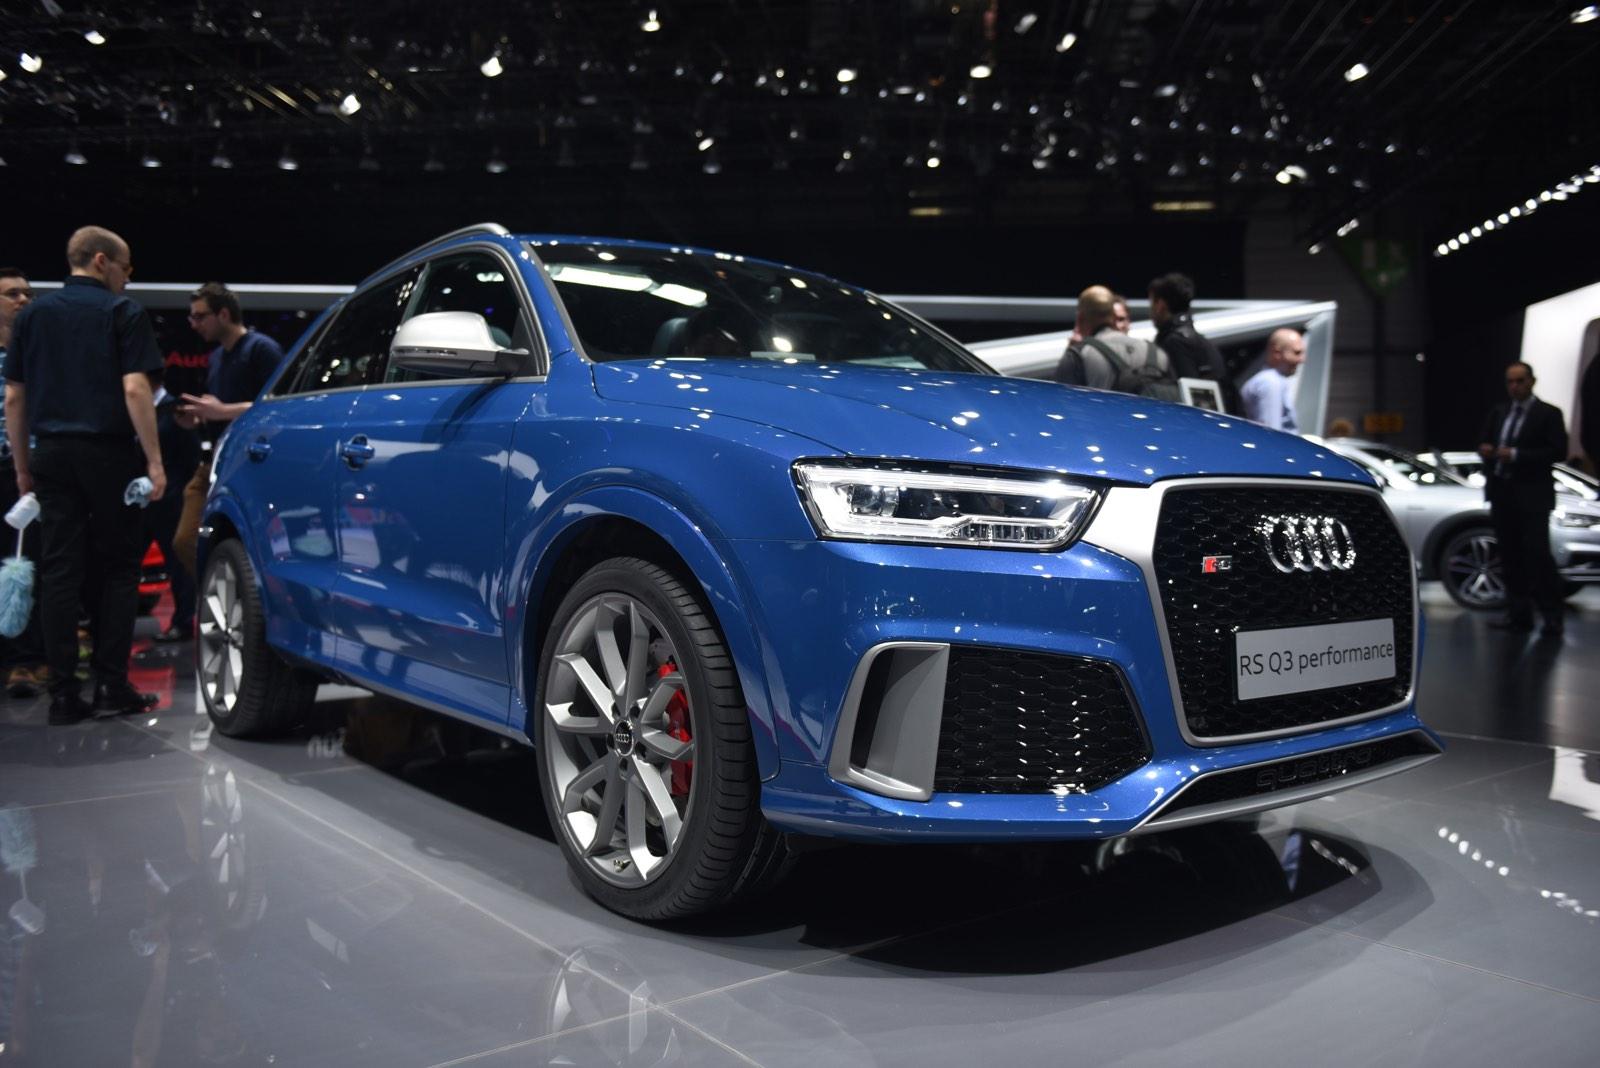 Audi Q3 RS Performance at Geneva 20161